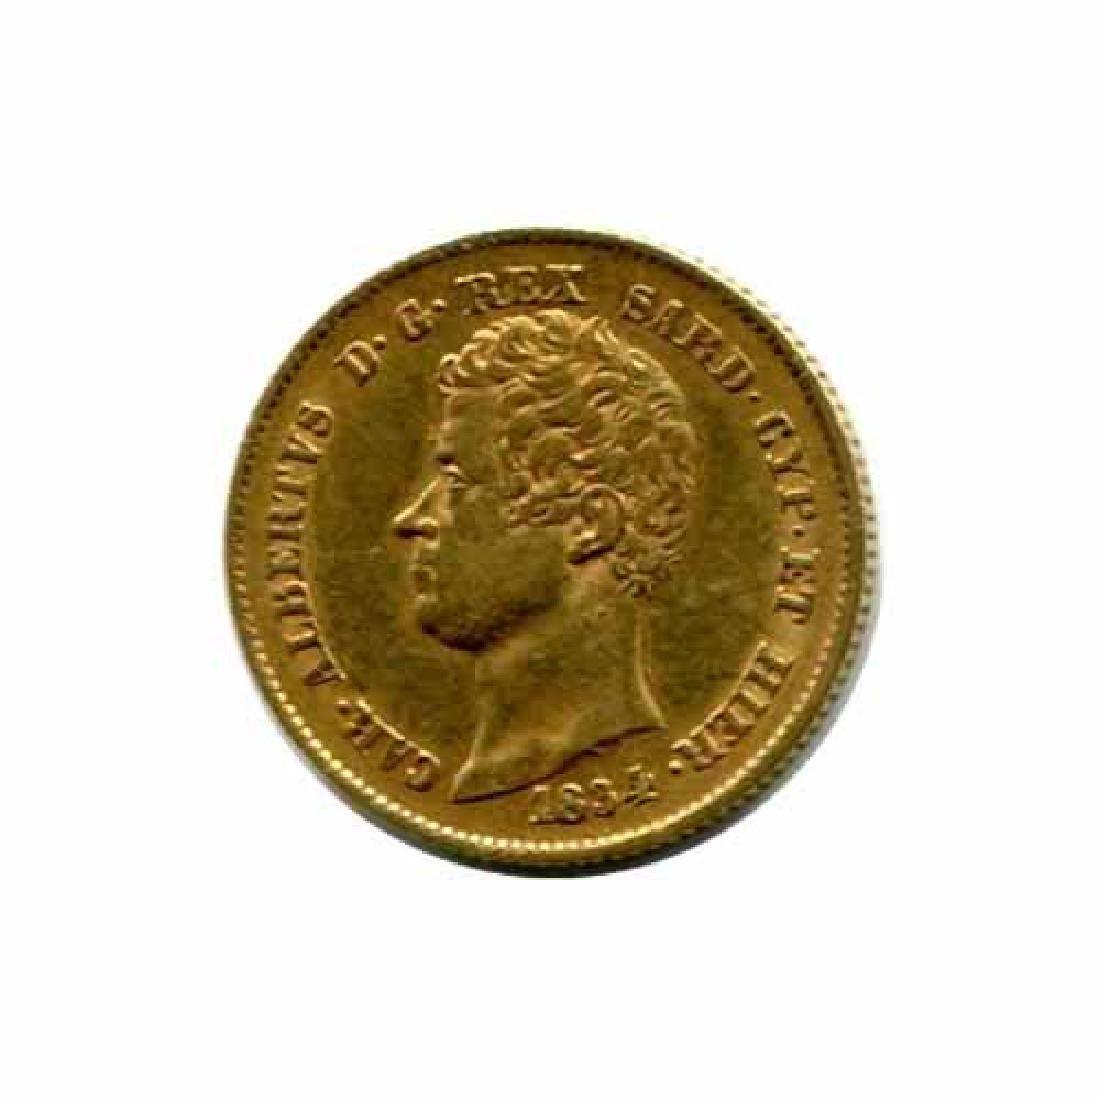 Italy Sardinia 20 lire gold 1831-1849 XF